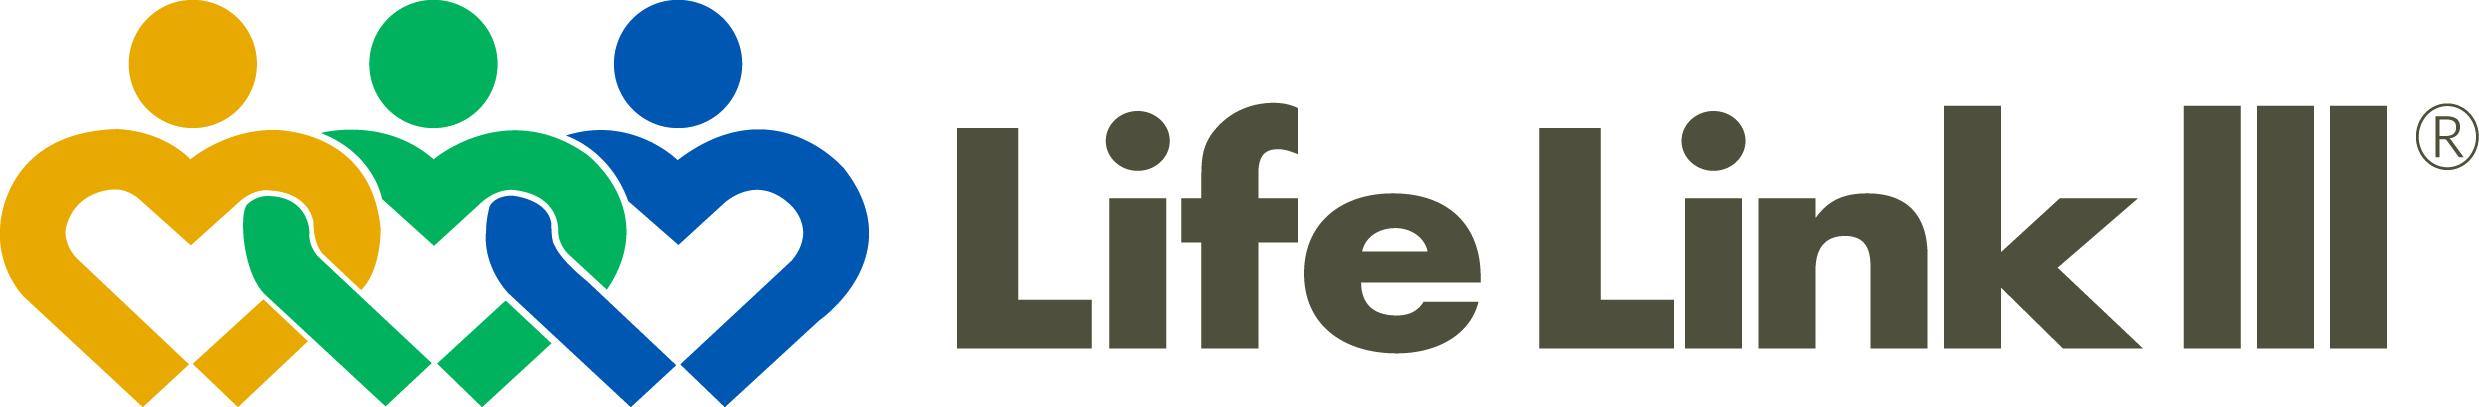 Life Link 3 Logo